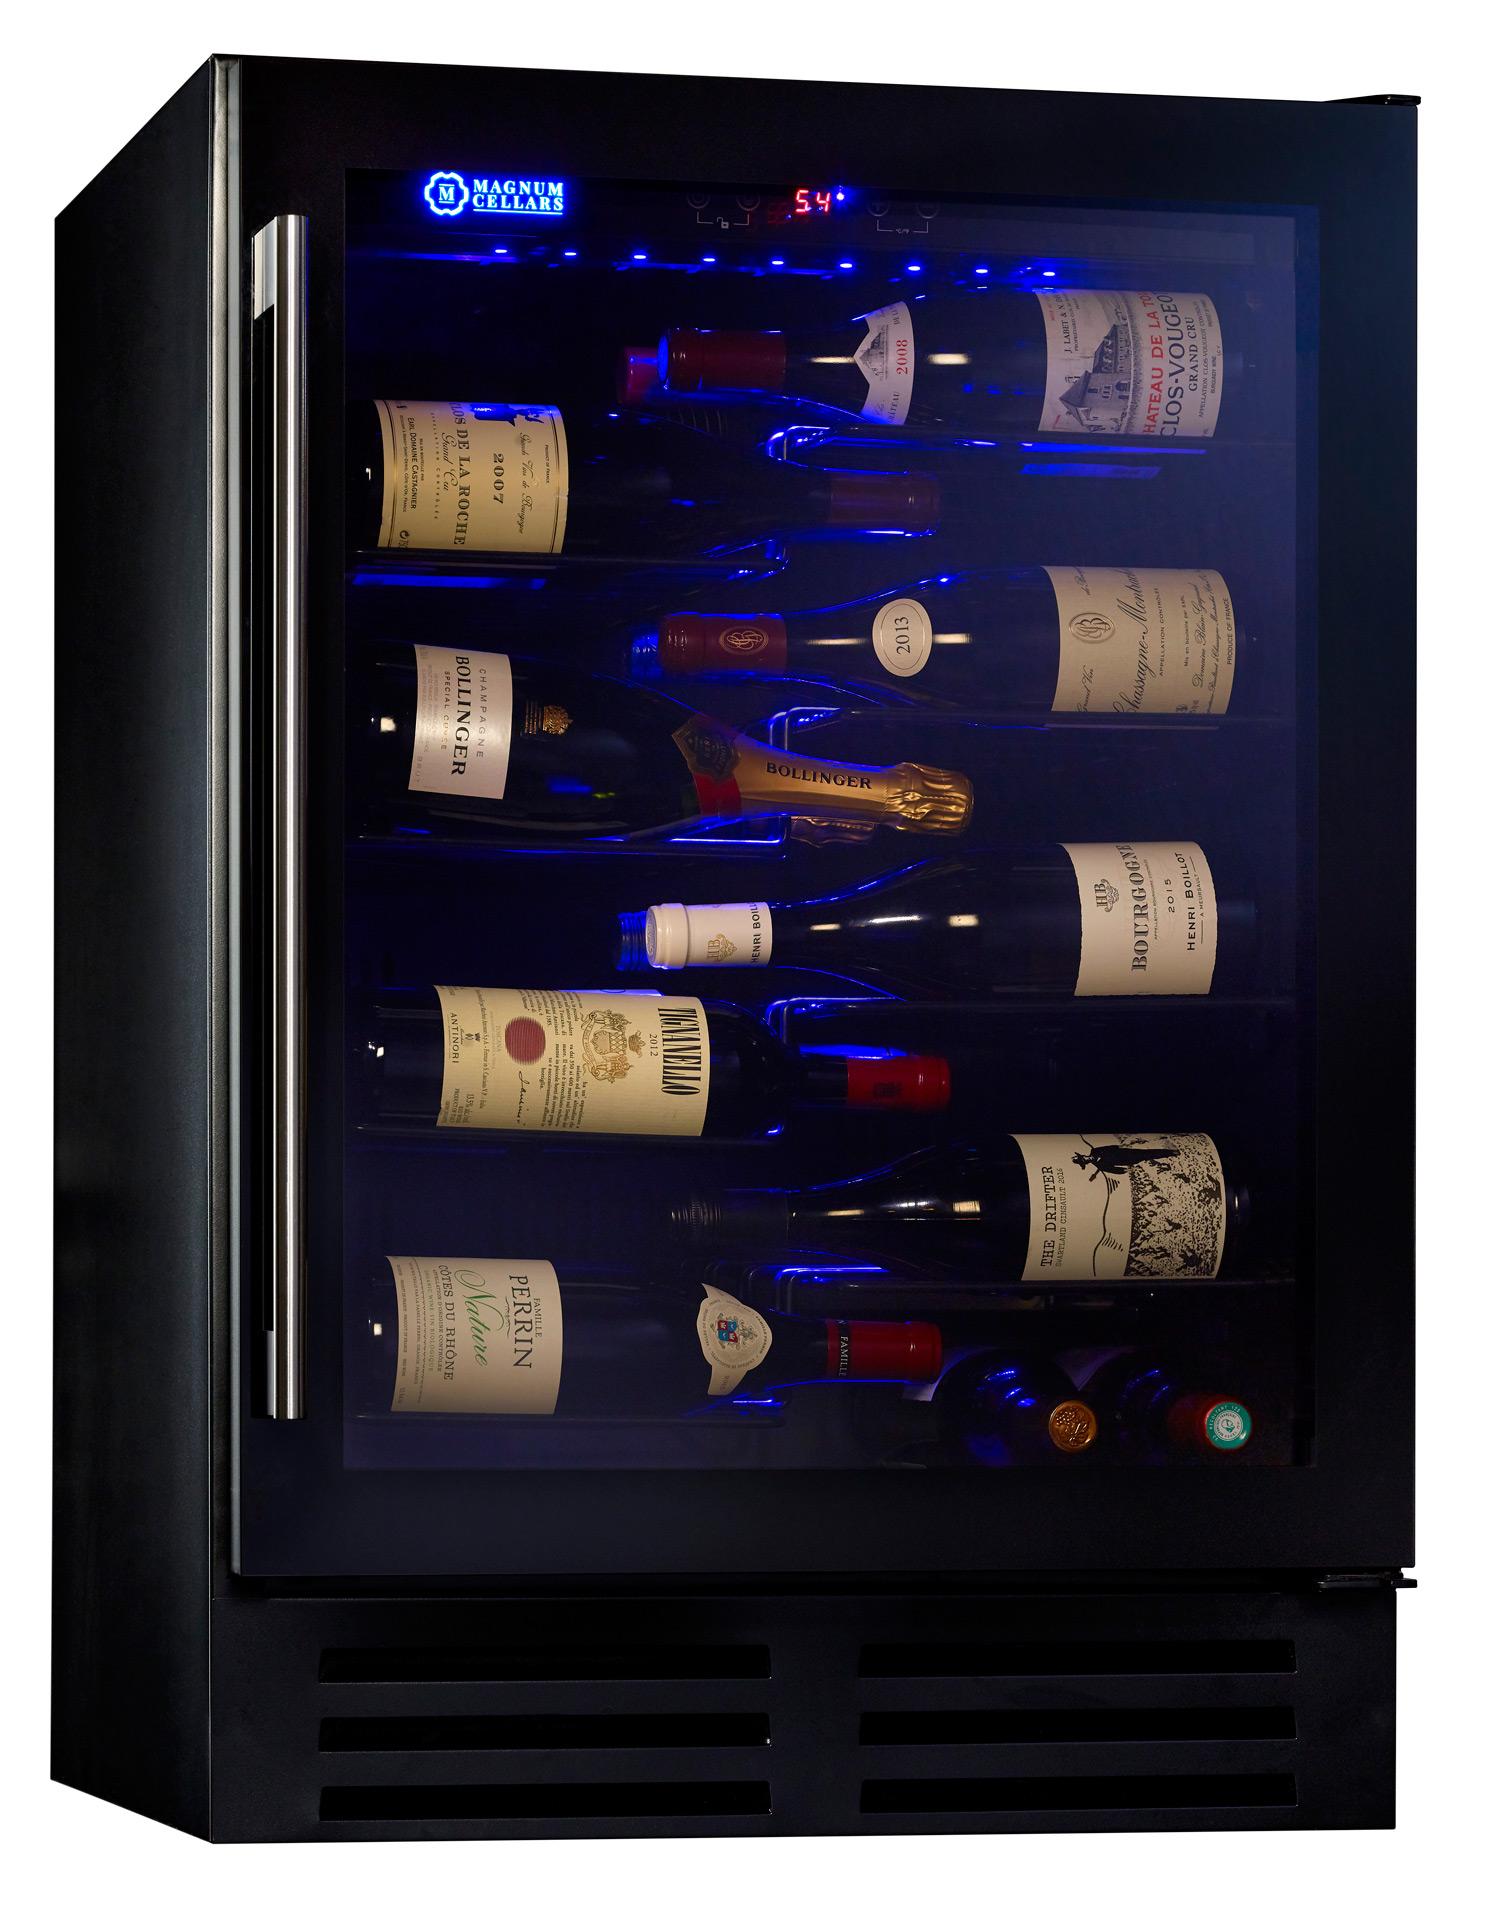 Magnum cellars - Designer series - 42 bouteilles/bottles - 1 zone